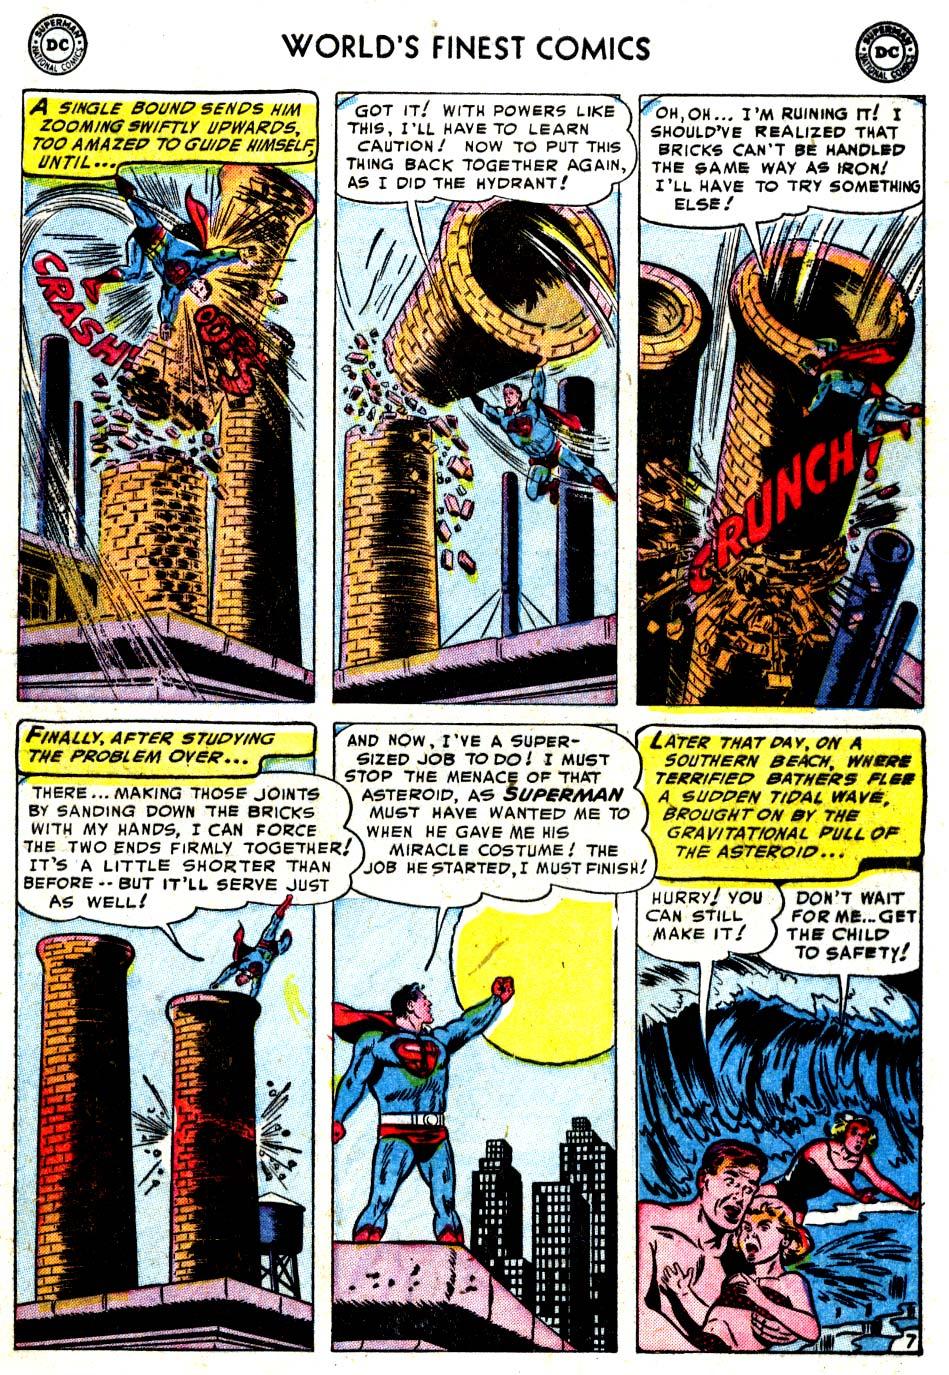 Read online World's Finest Comics comic -  Issue #68 - 9